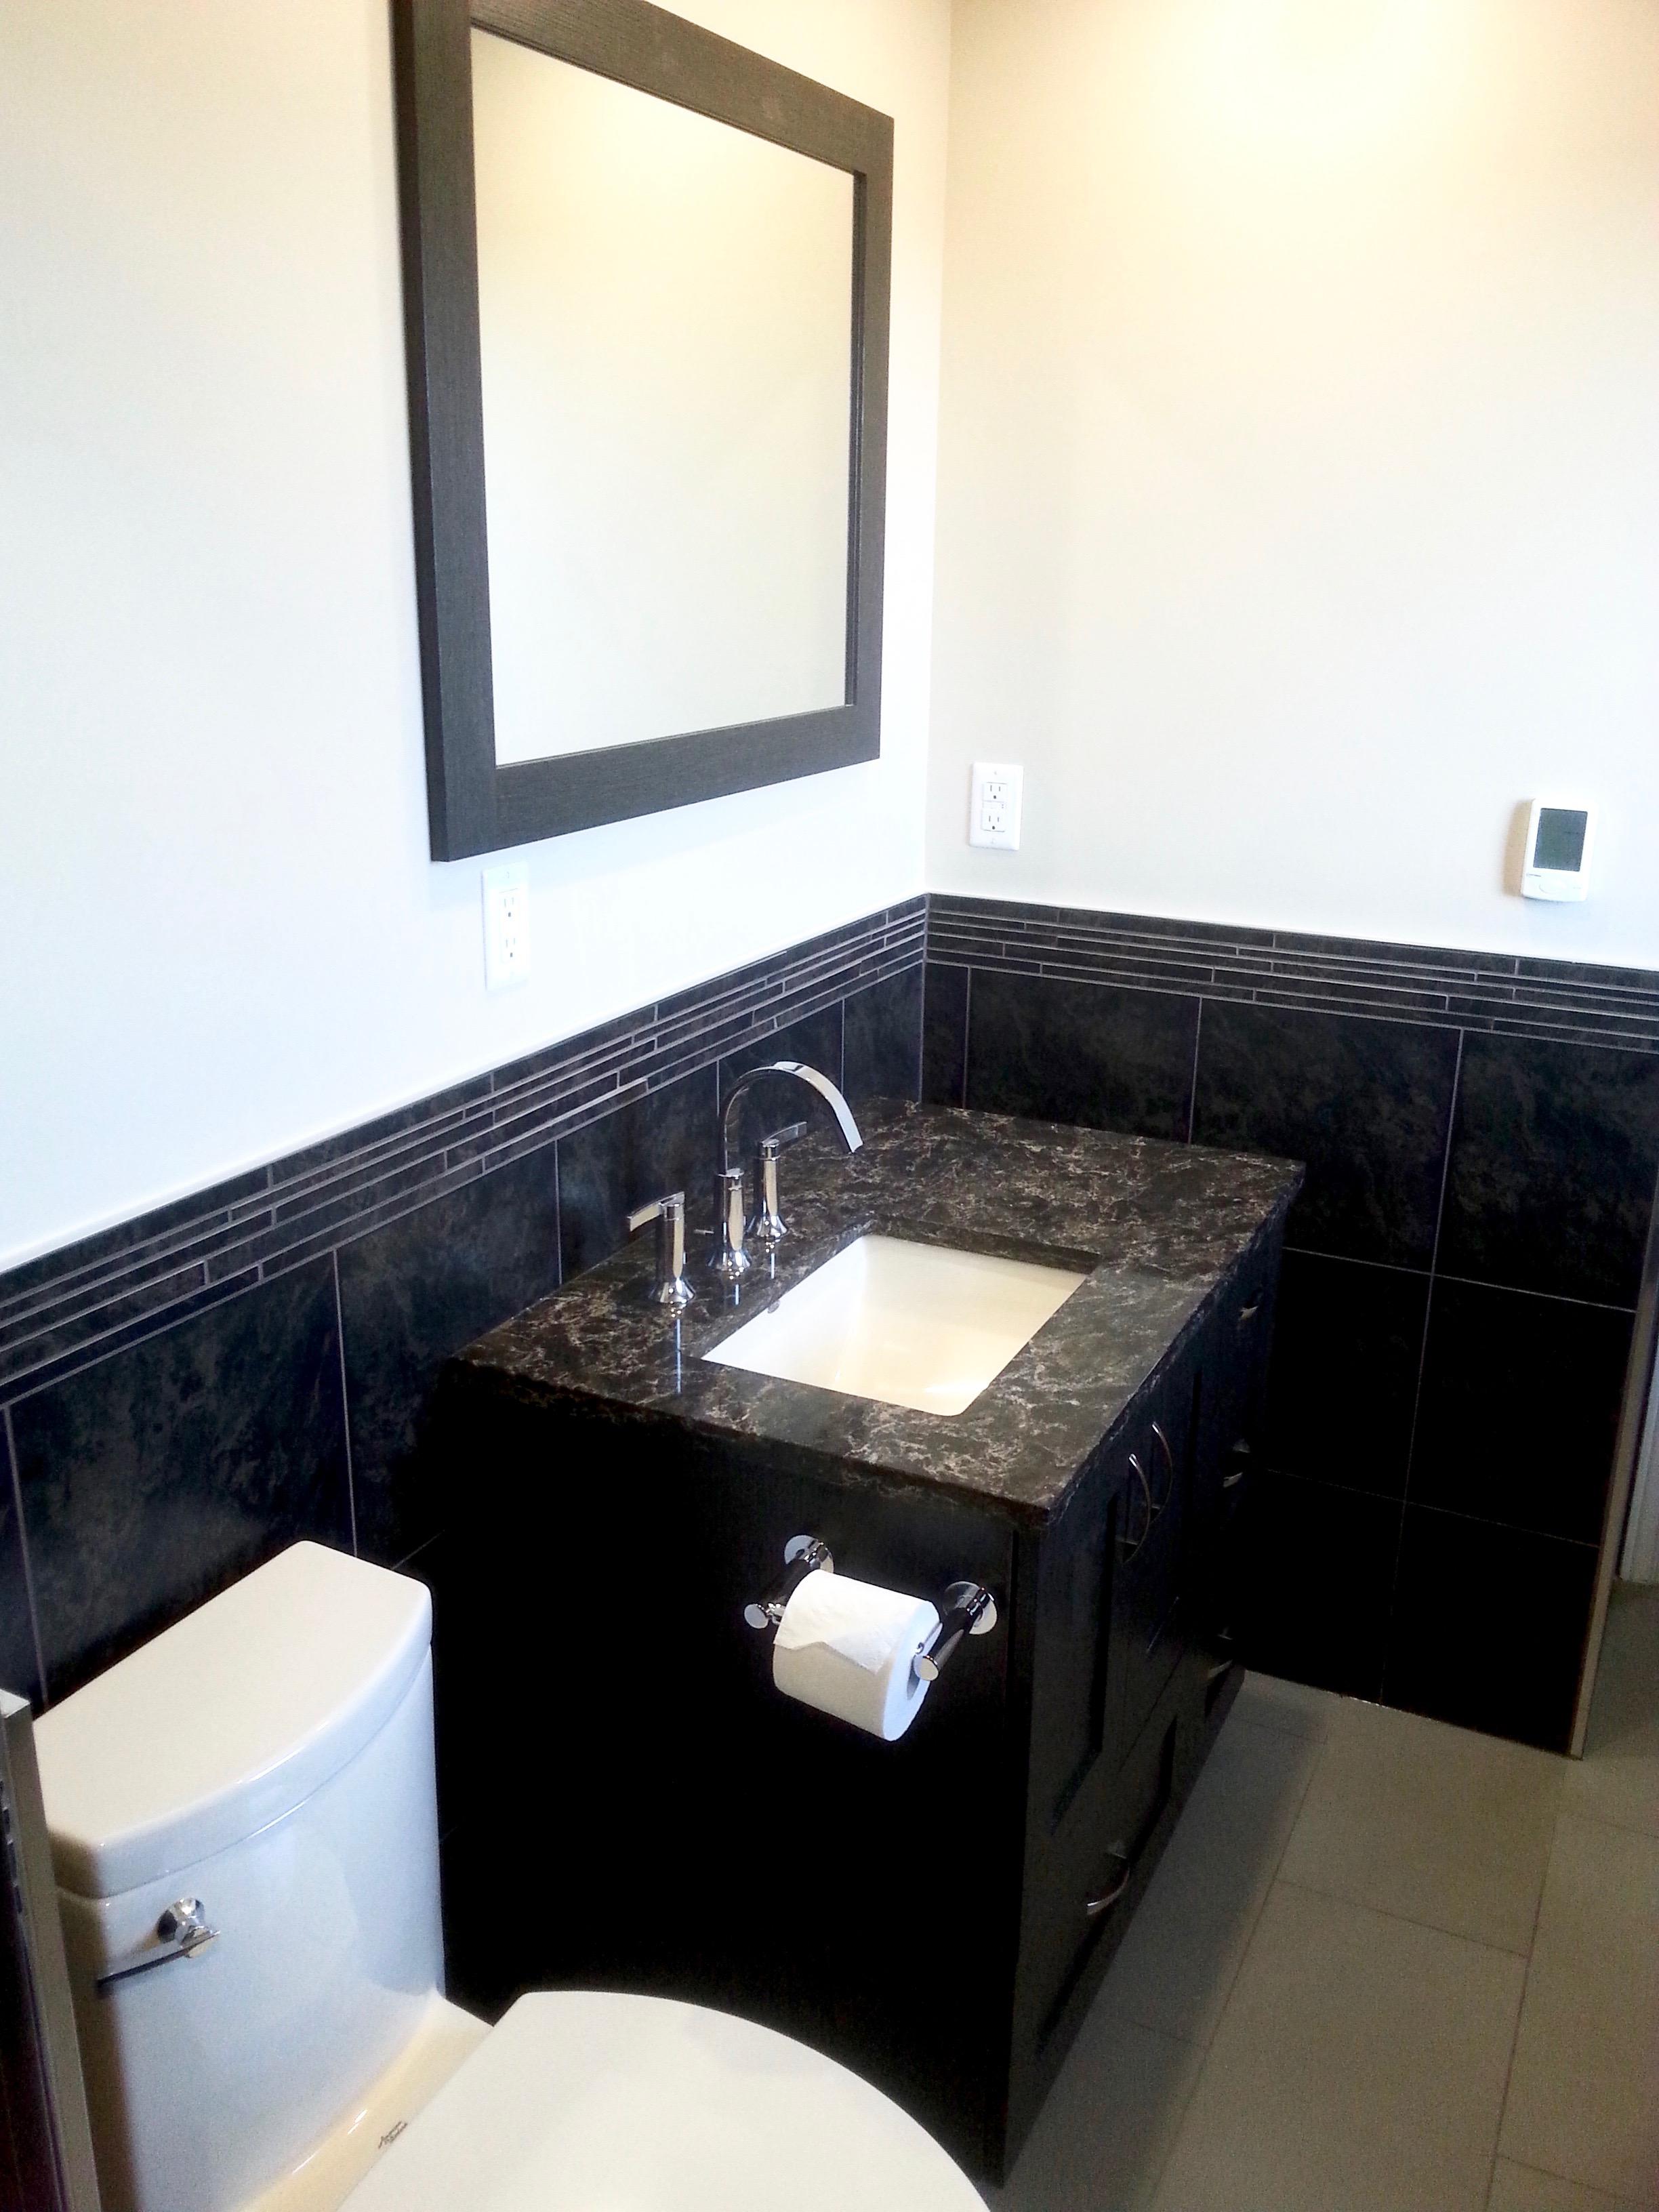 Customer vanity and wall tile